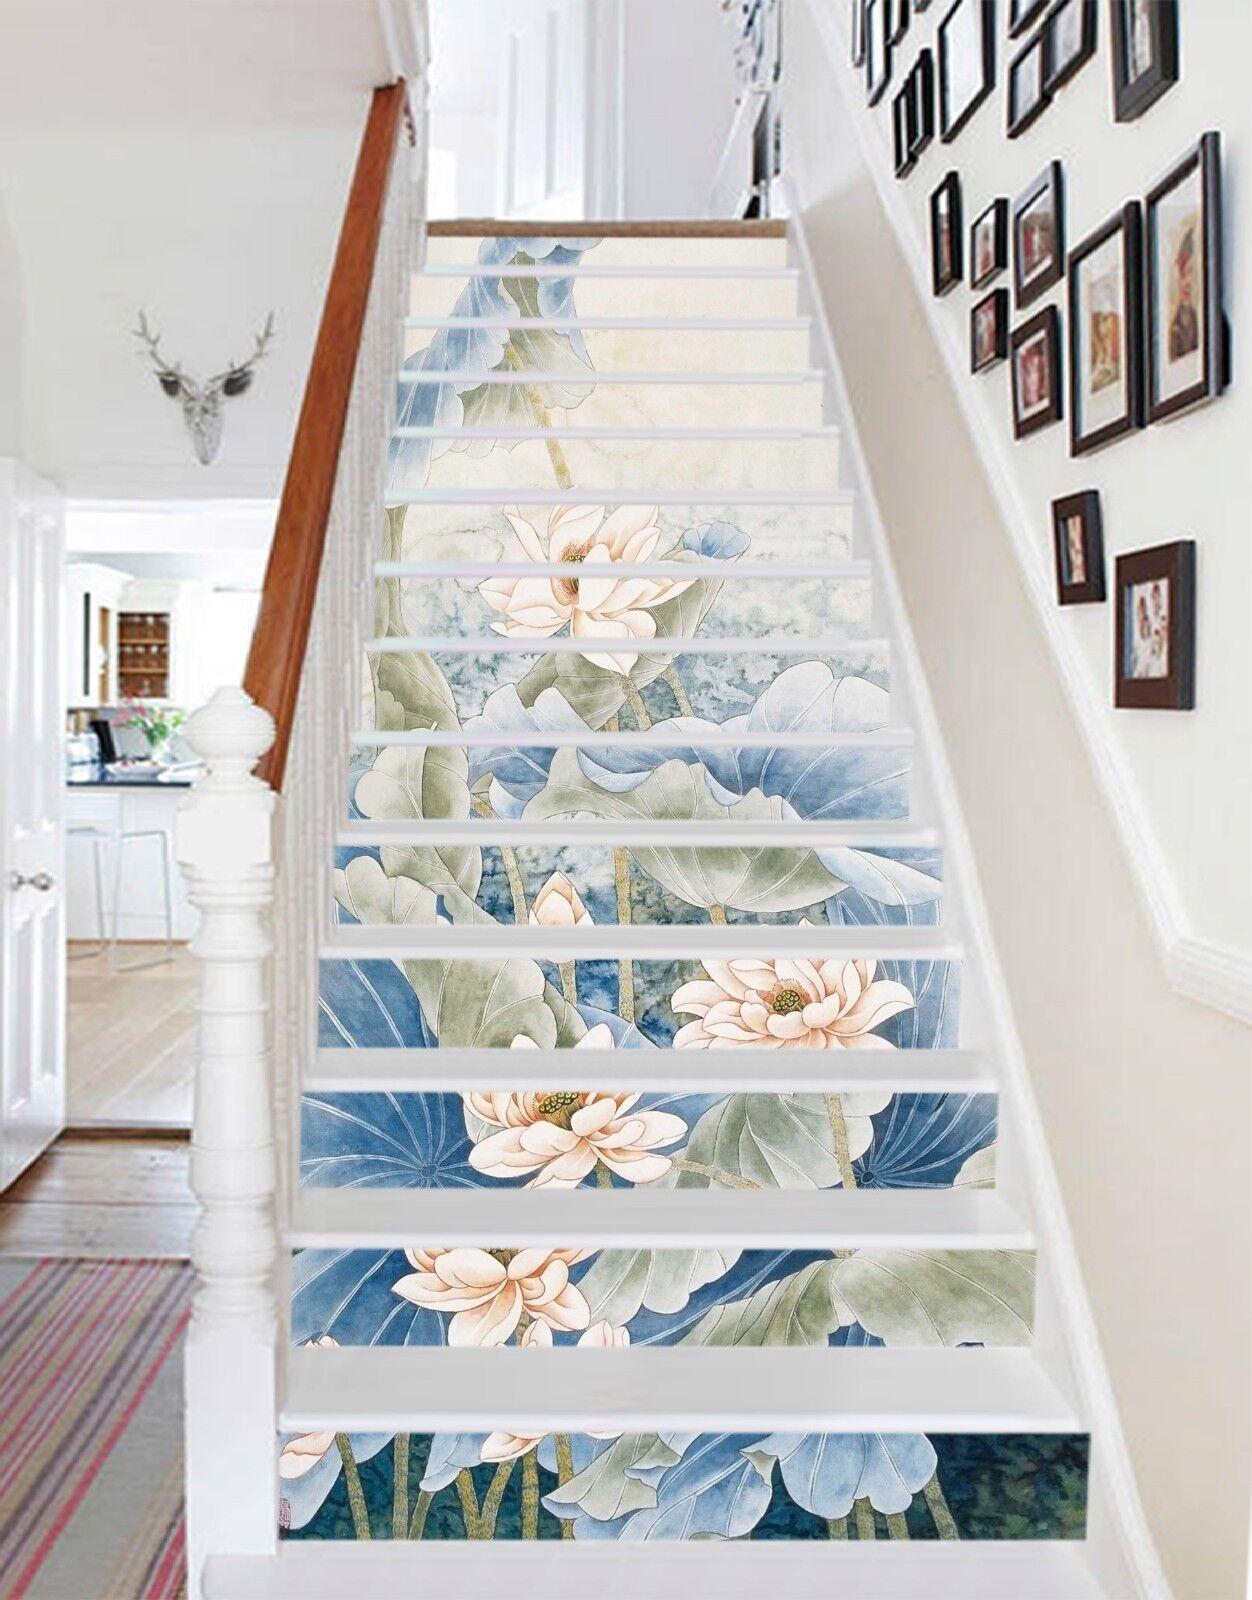 3D Lotus Painted 16 Stair Risers Decoration Photo Mural Vinyl Decal Wallpaper US